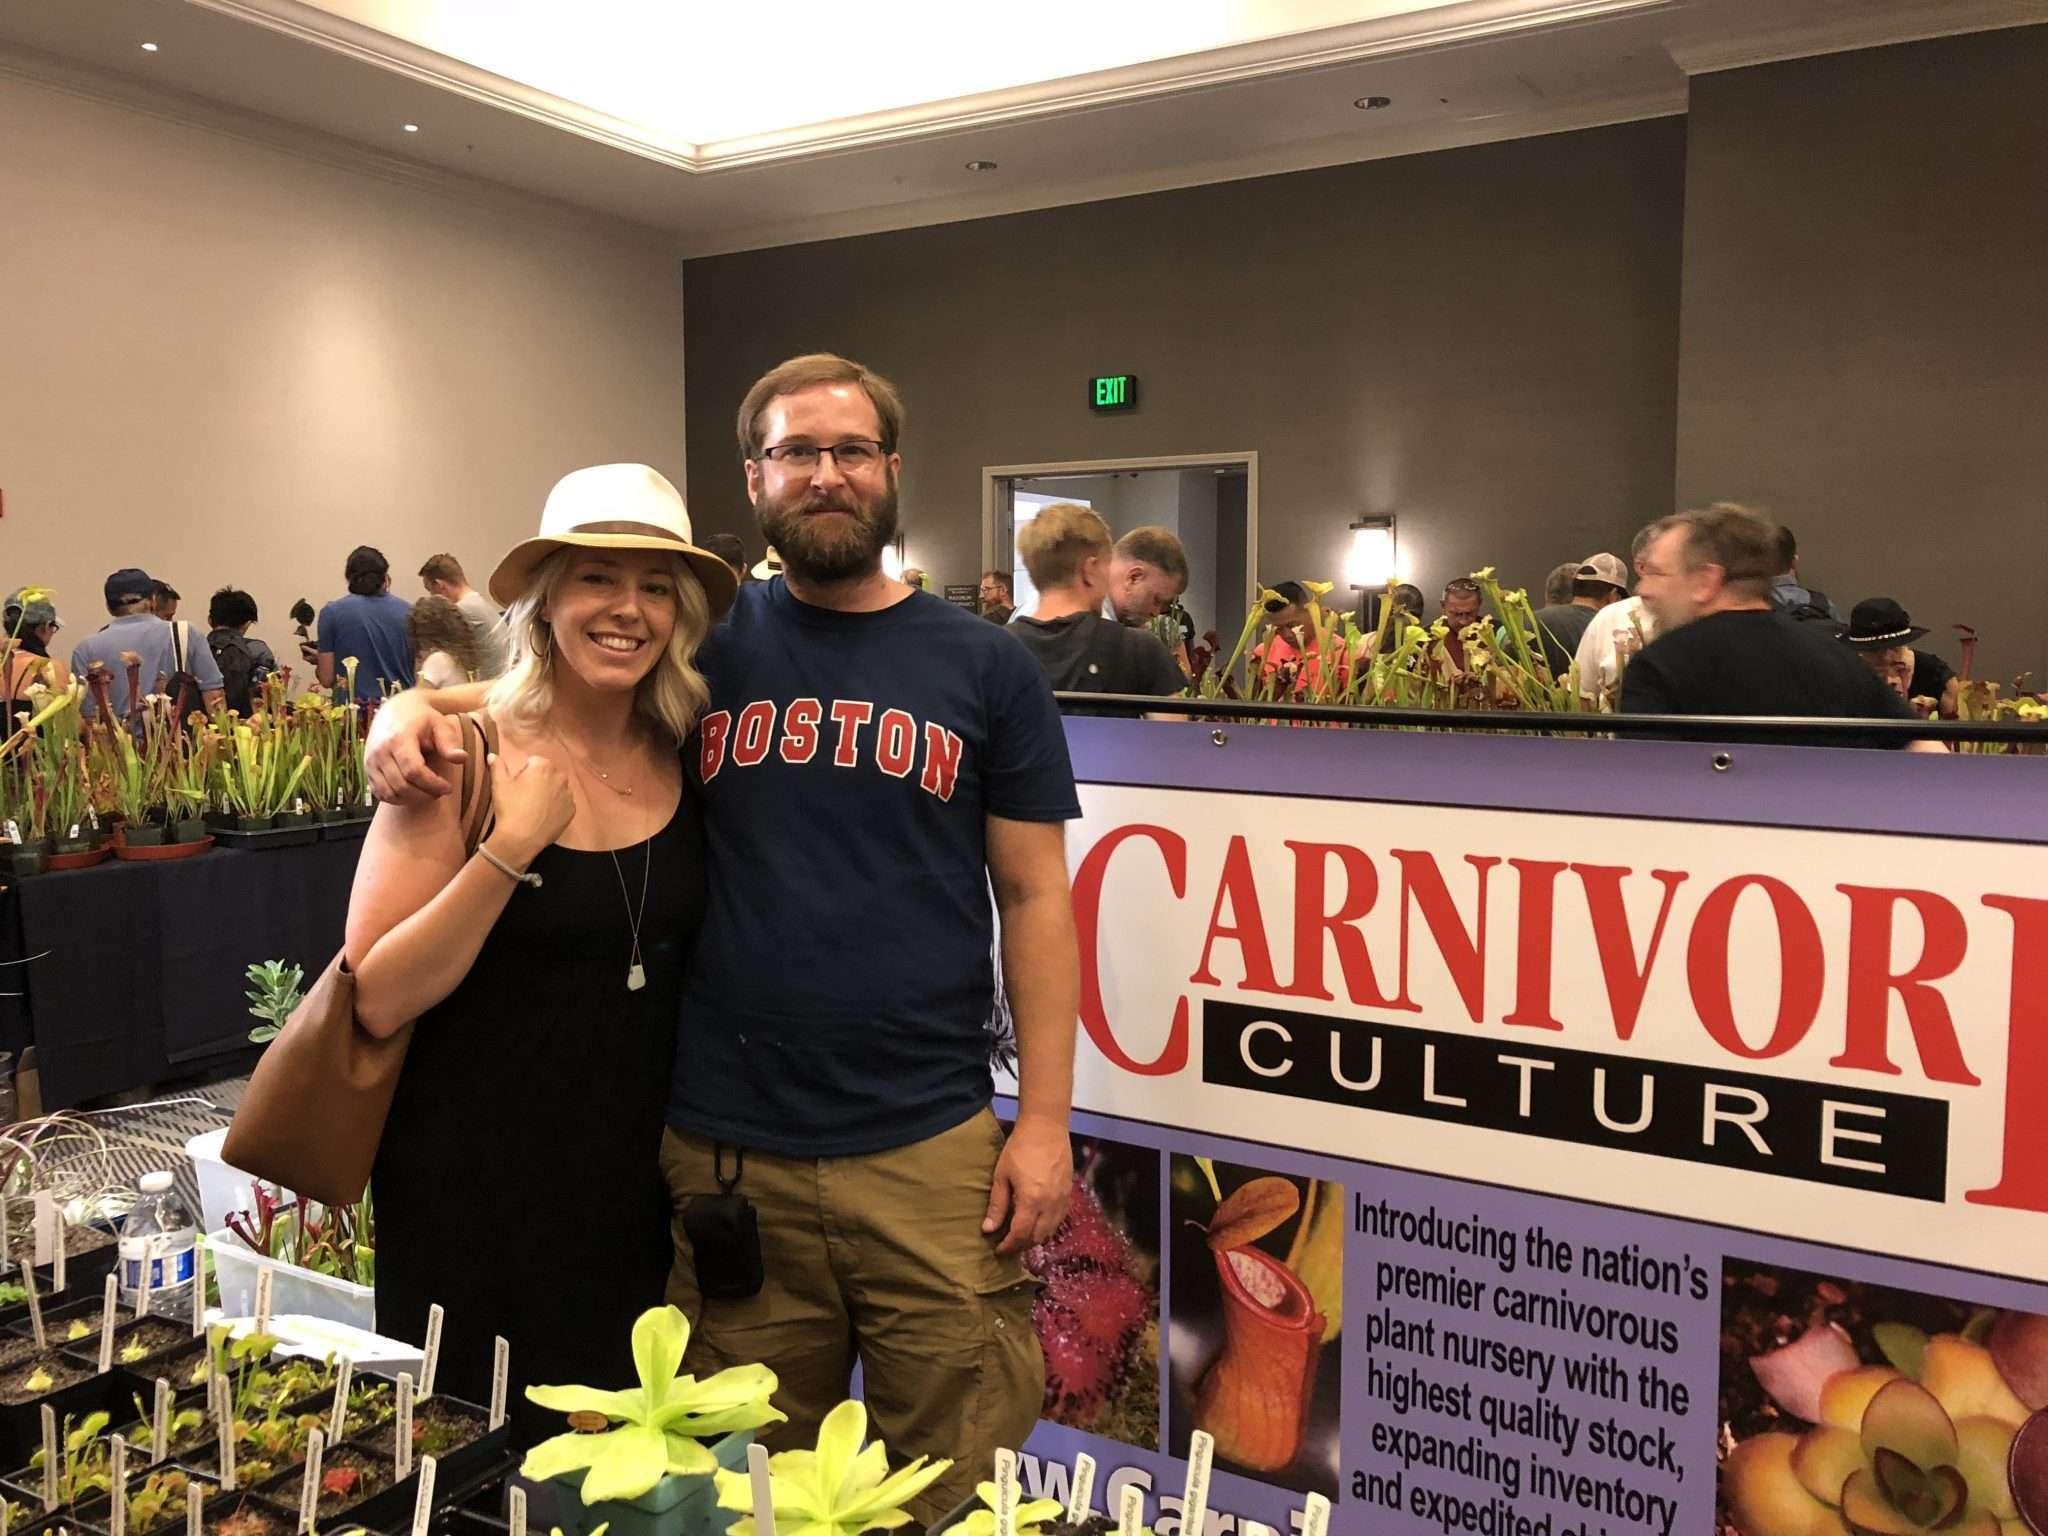 Carnivore Culture